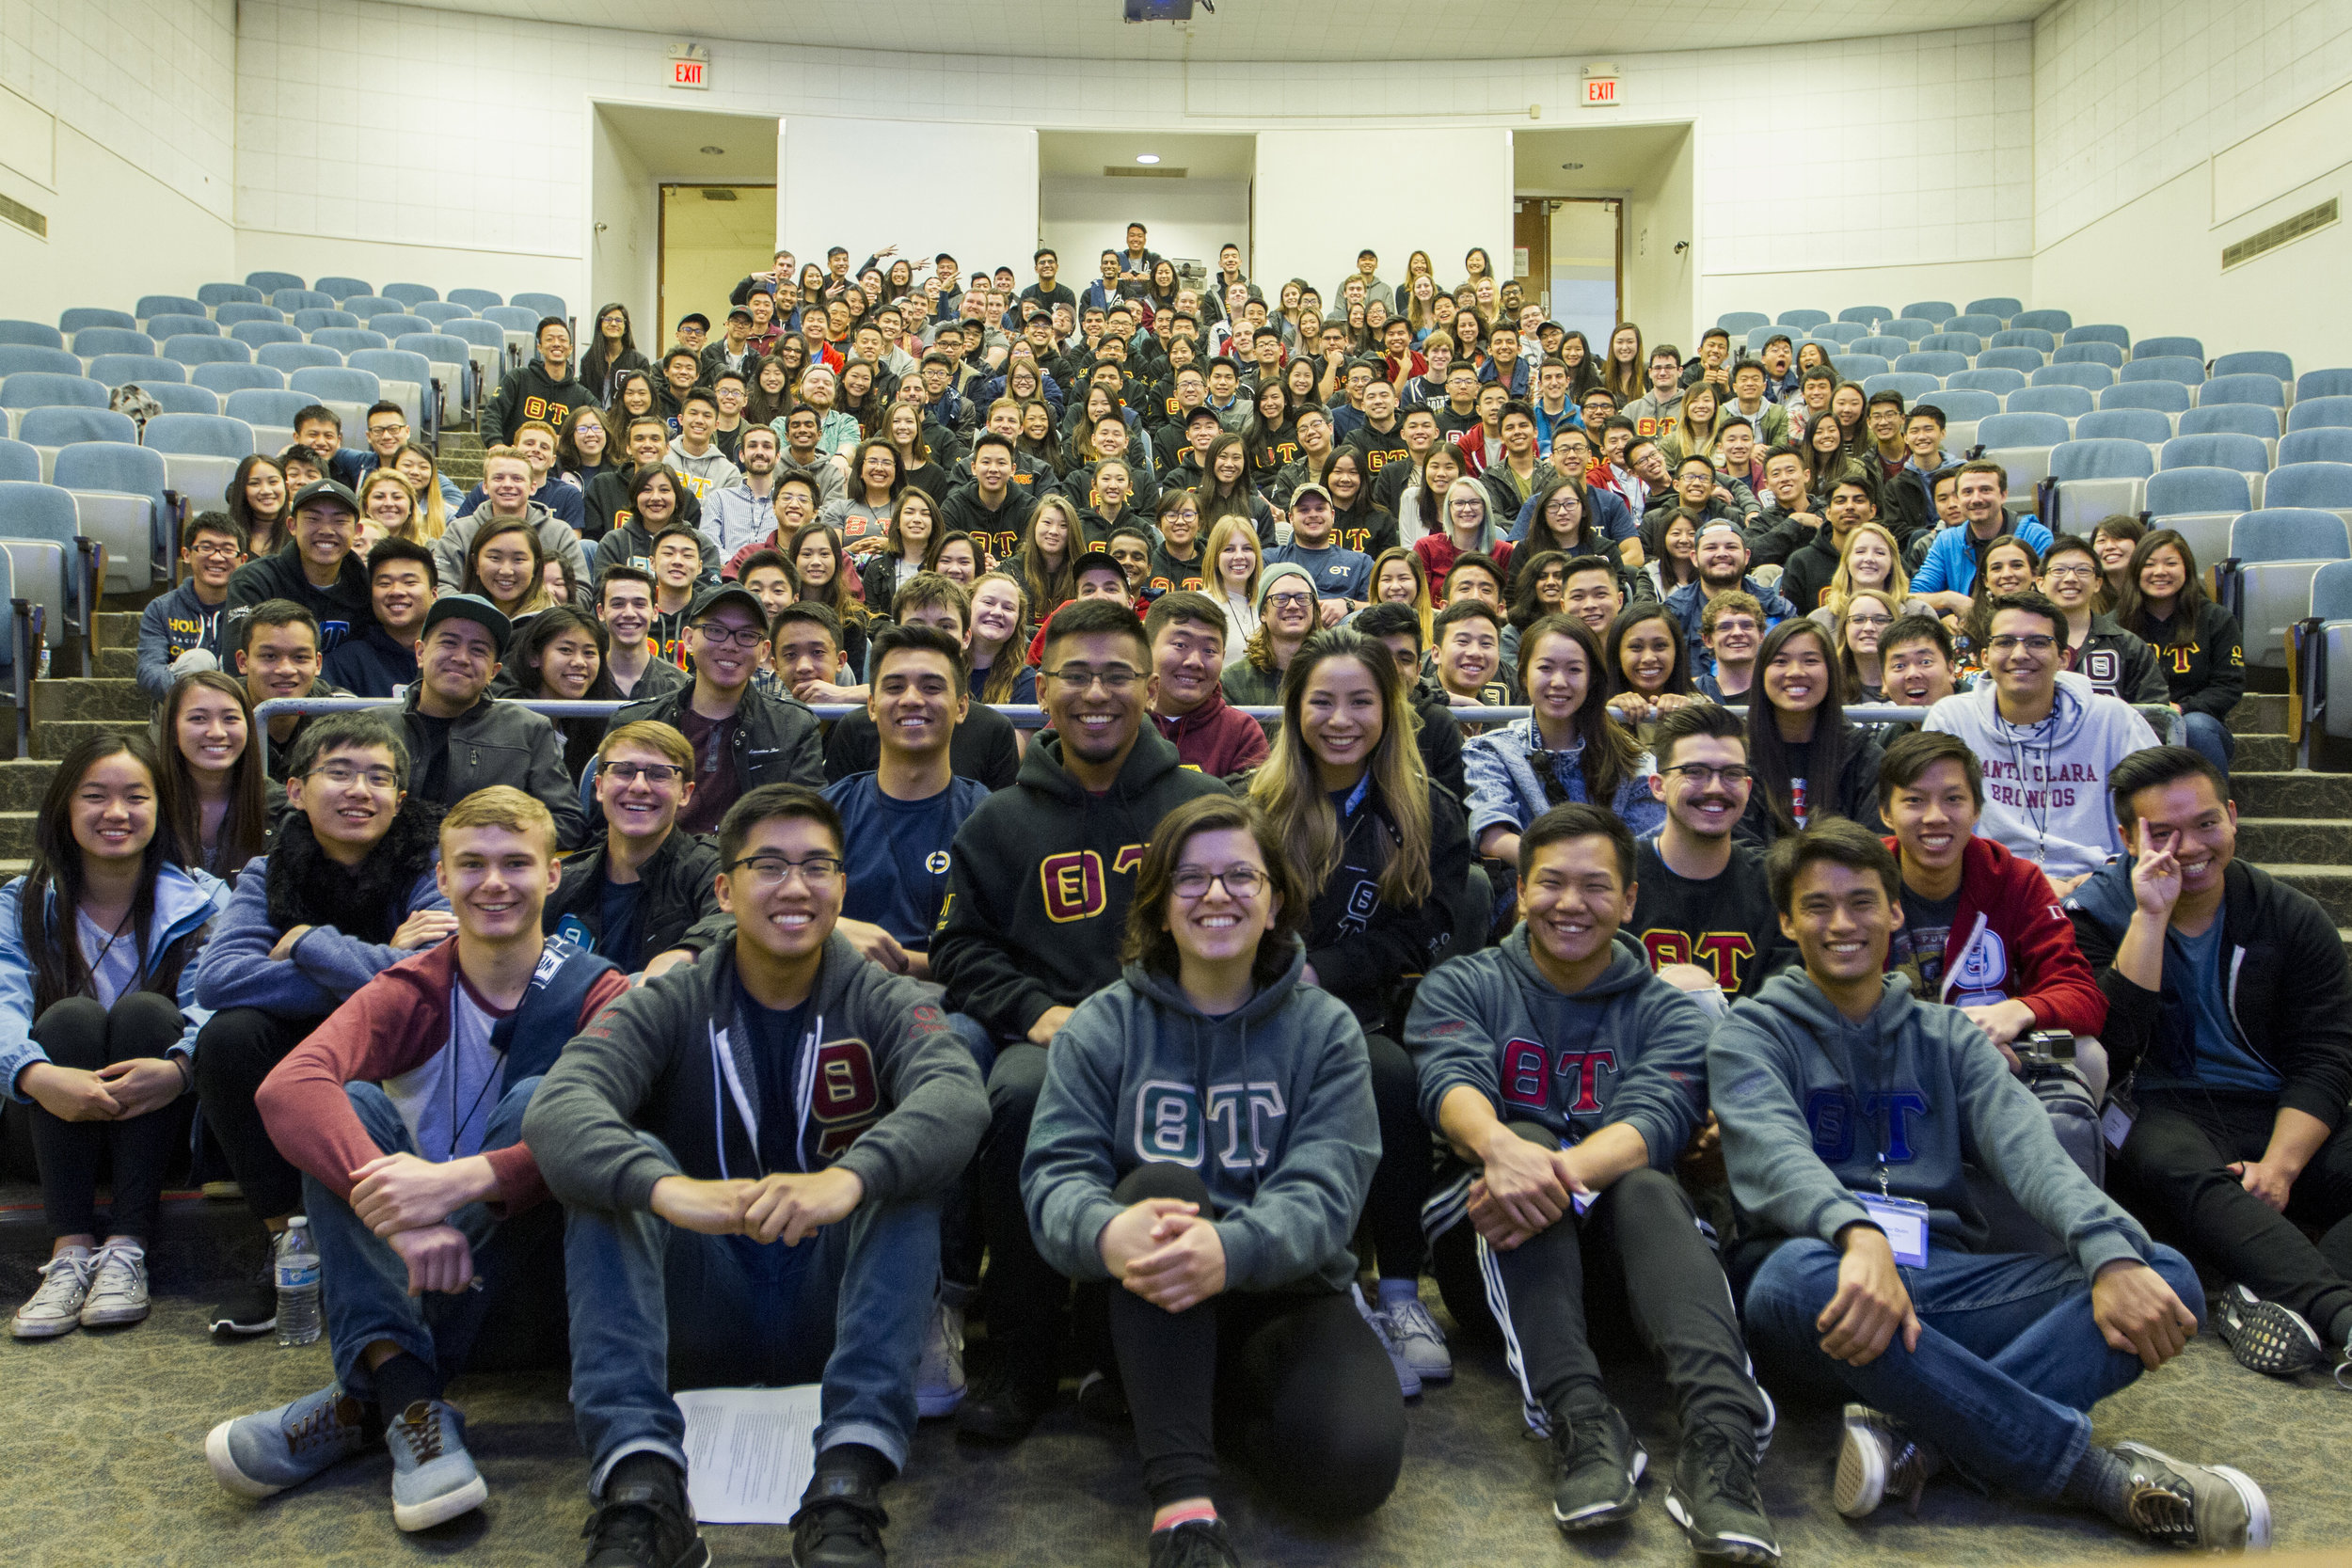 Omicron Gamma Regionals at UC Davis